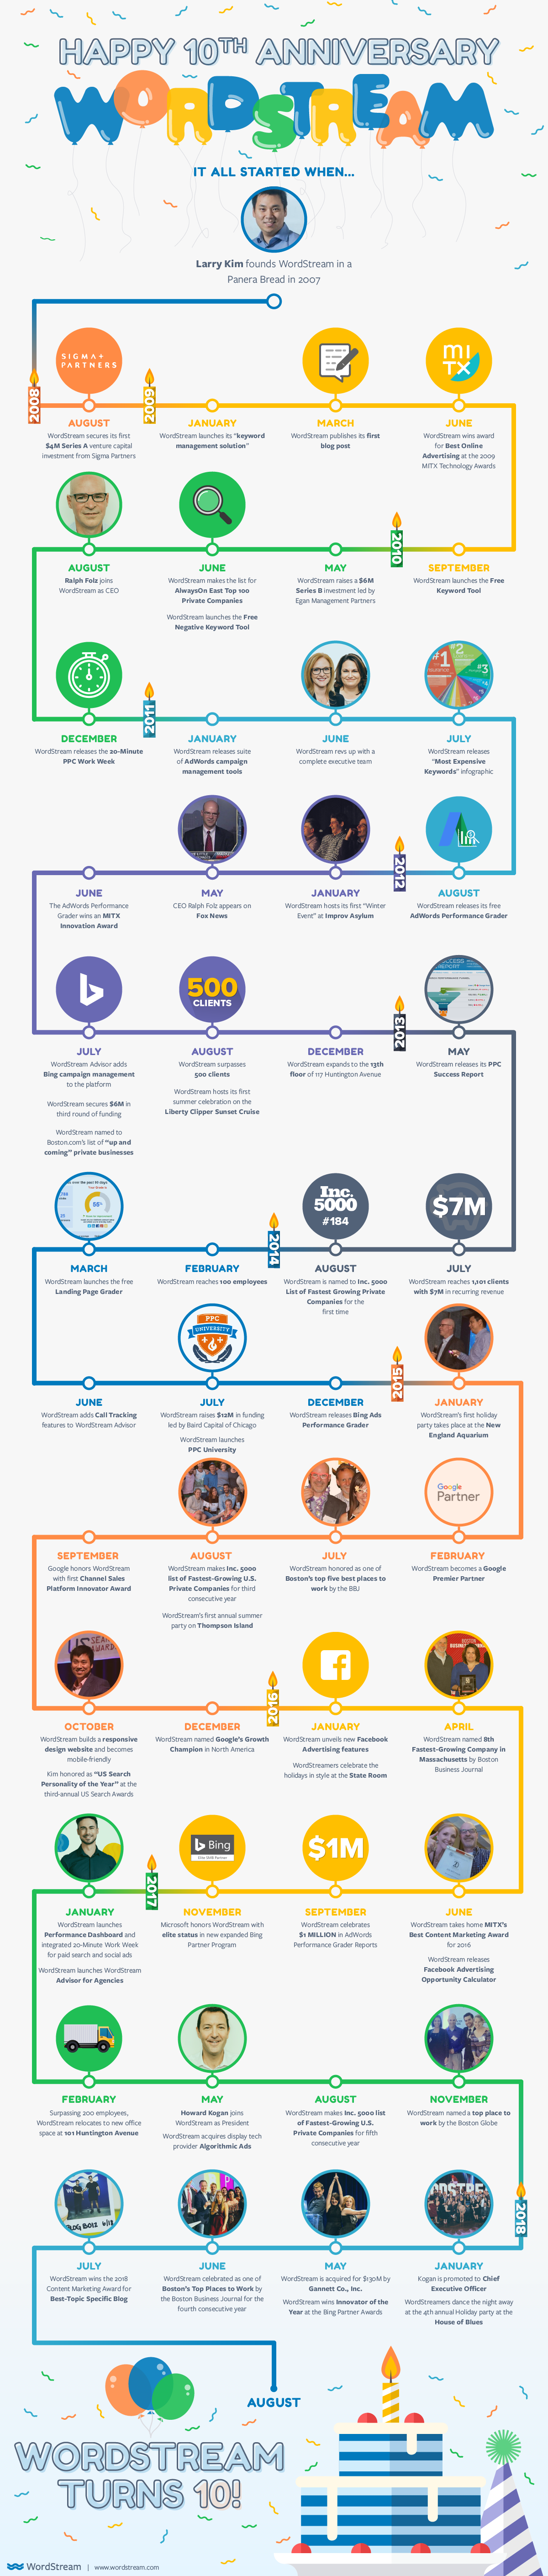 wordstream anniversary infographic